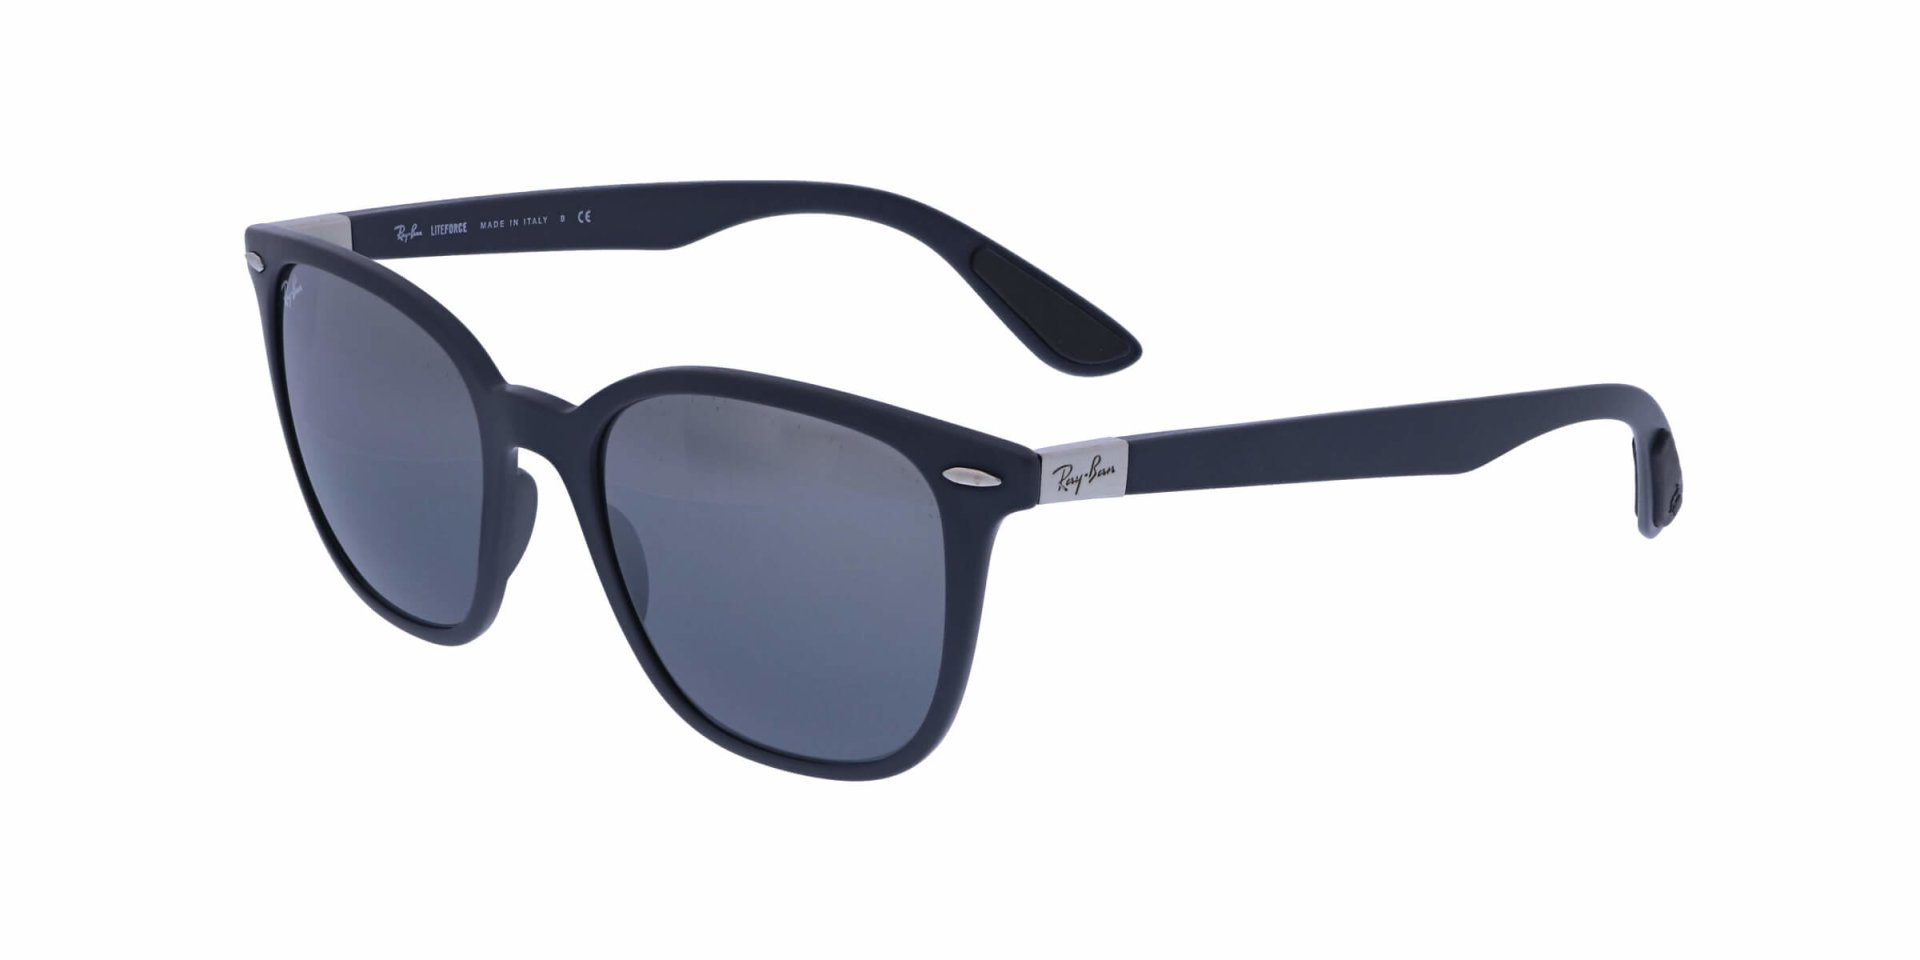 6c94c33715 Sunglasses RAY BAN